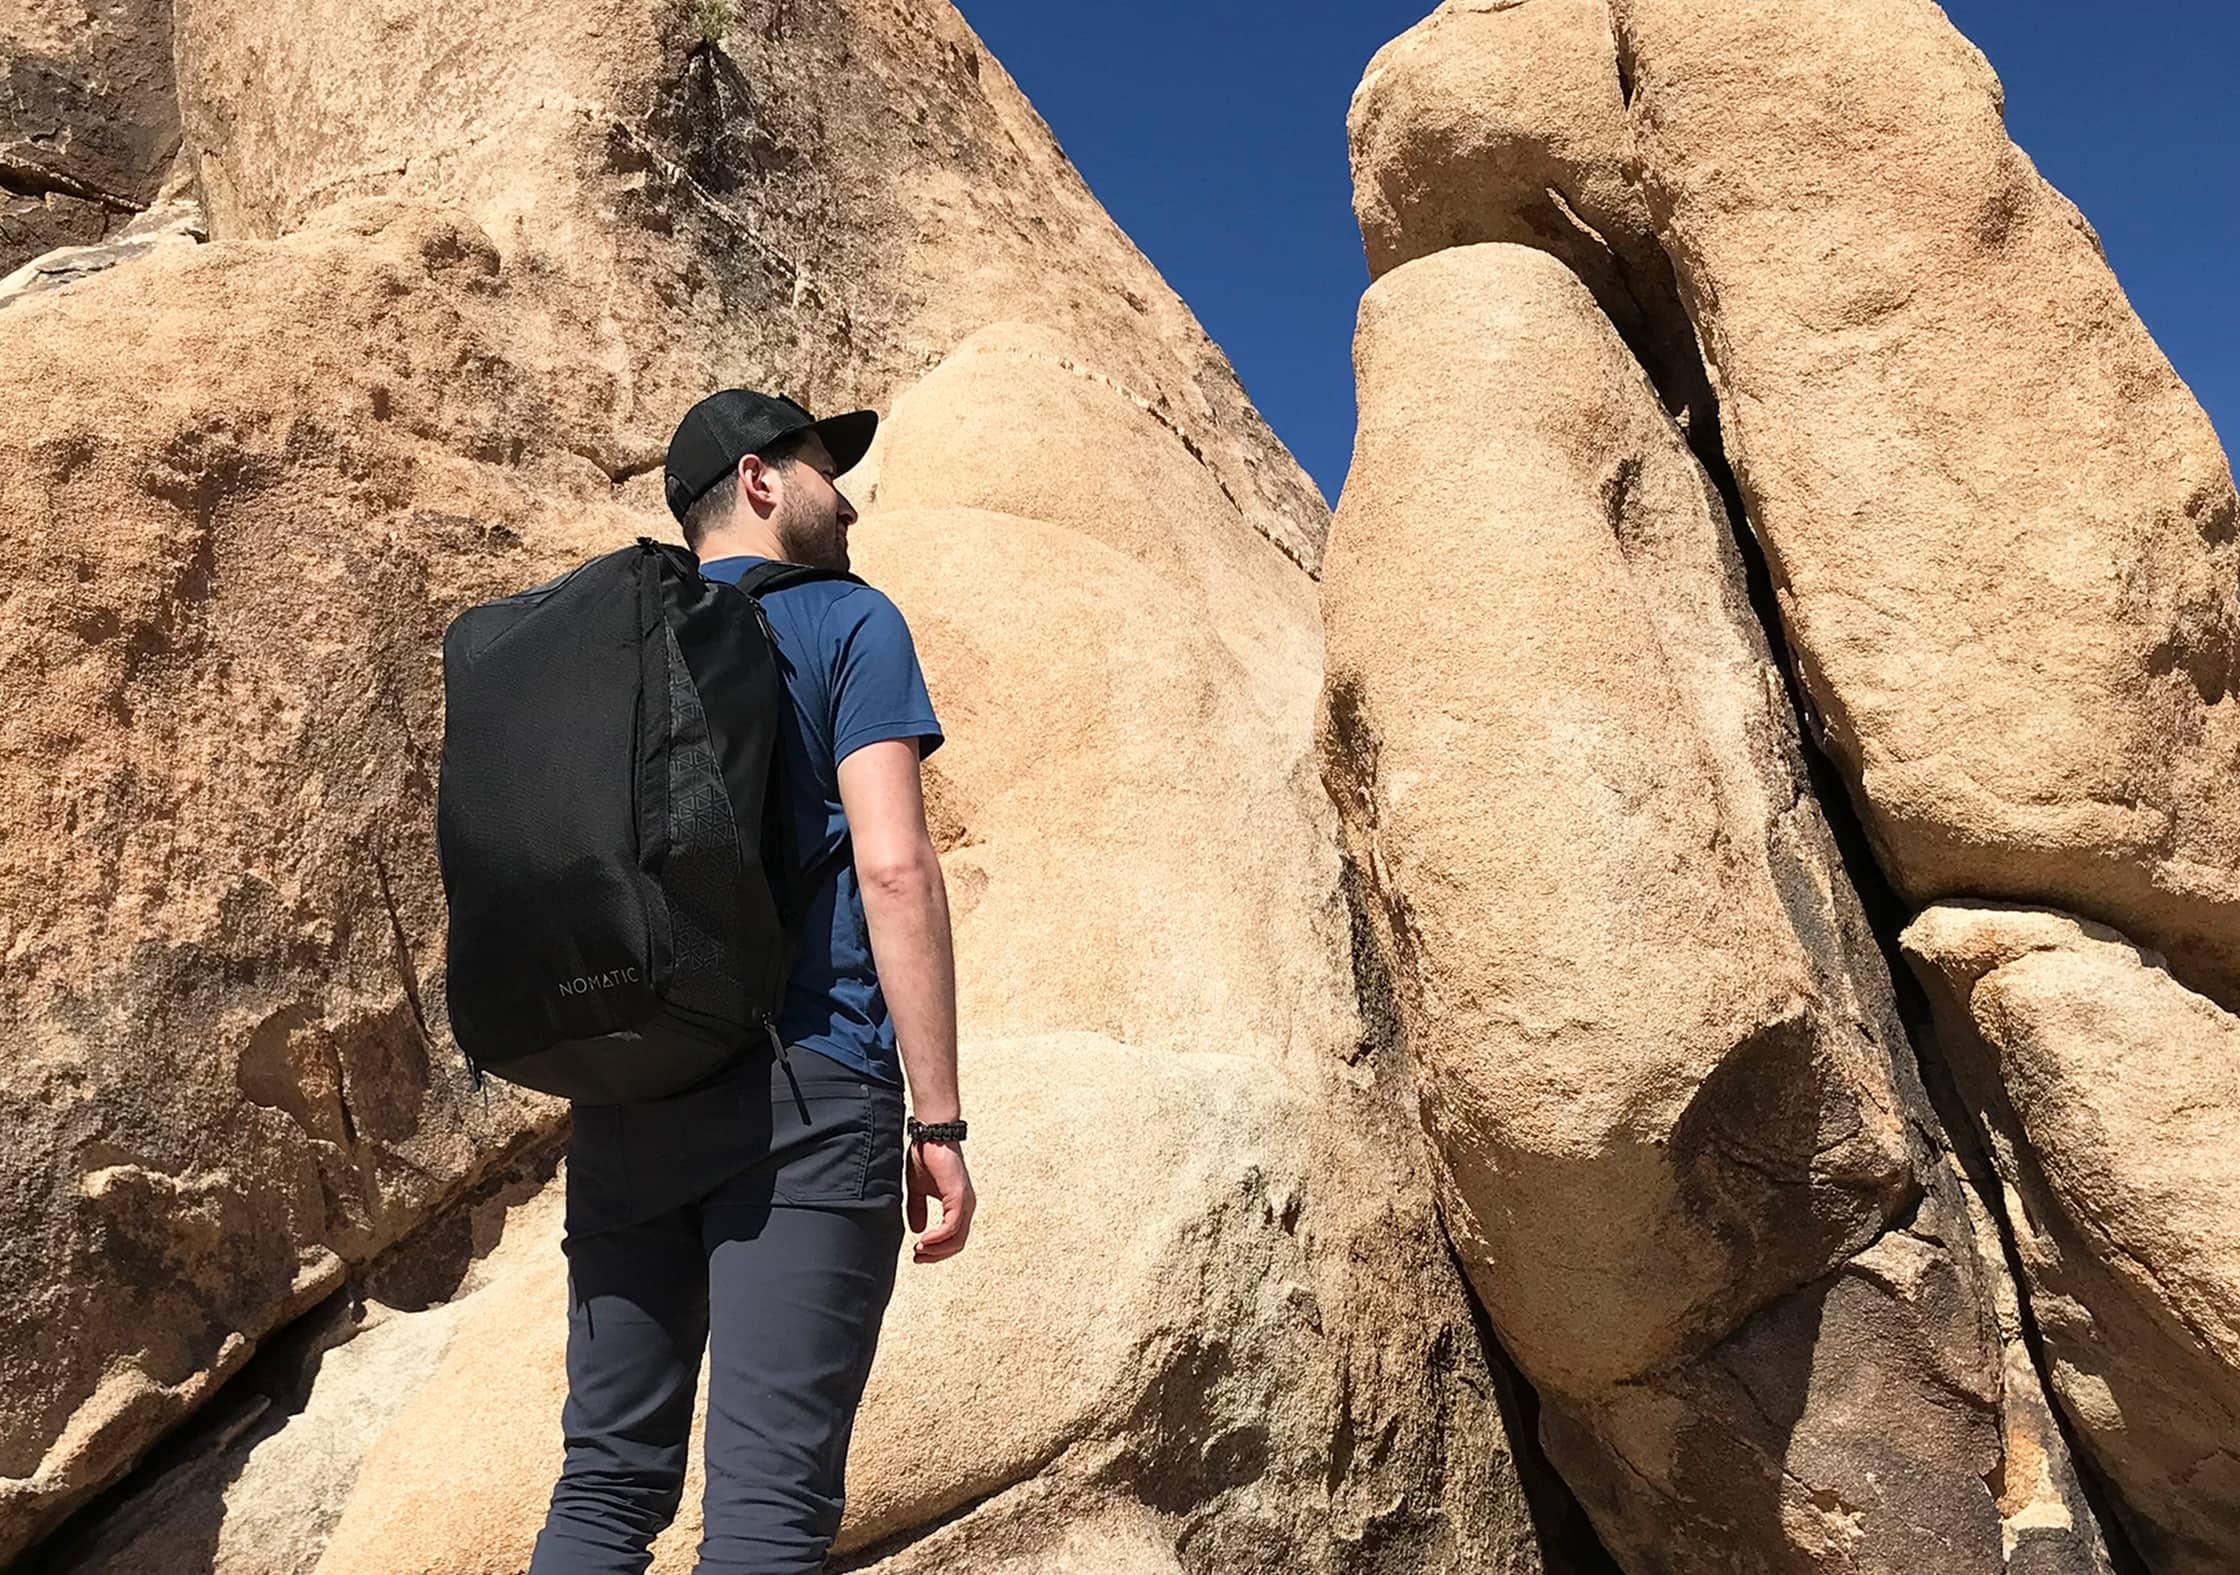 Nomatic Travel Bag In Joshua Tree